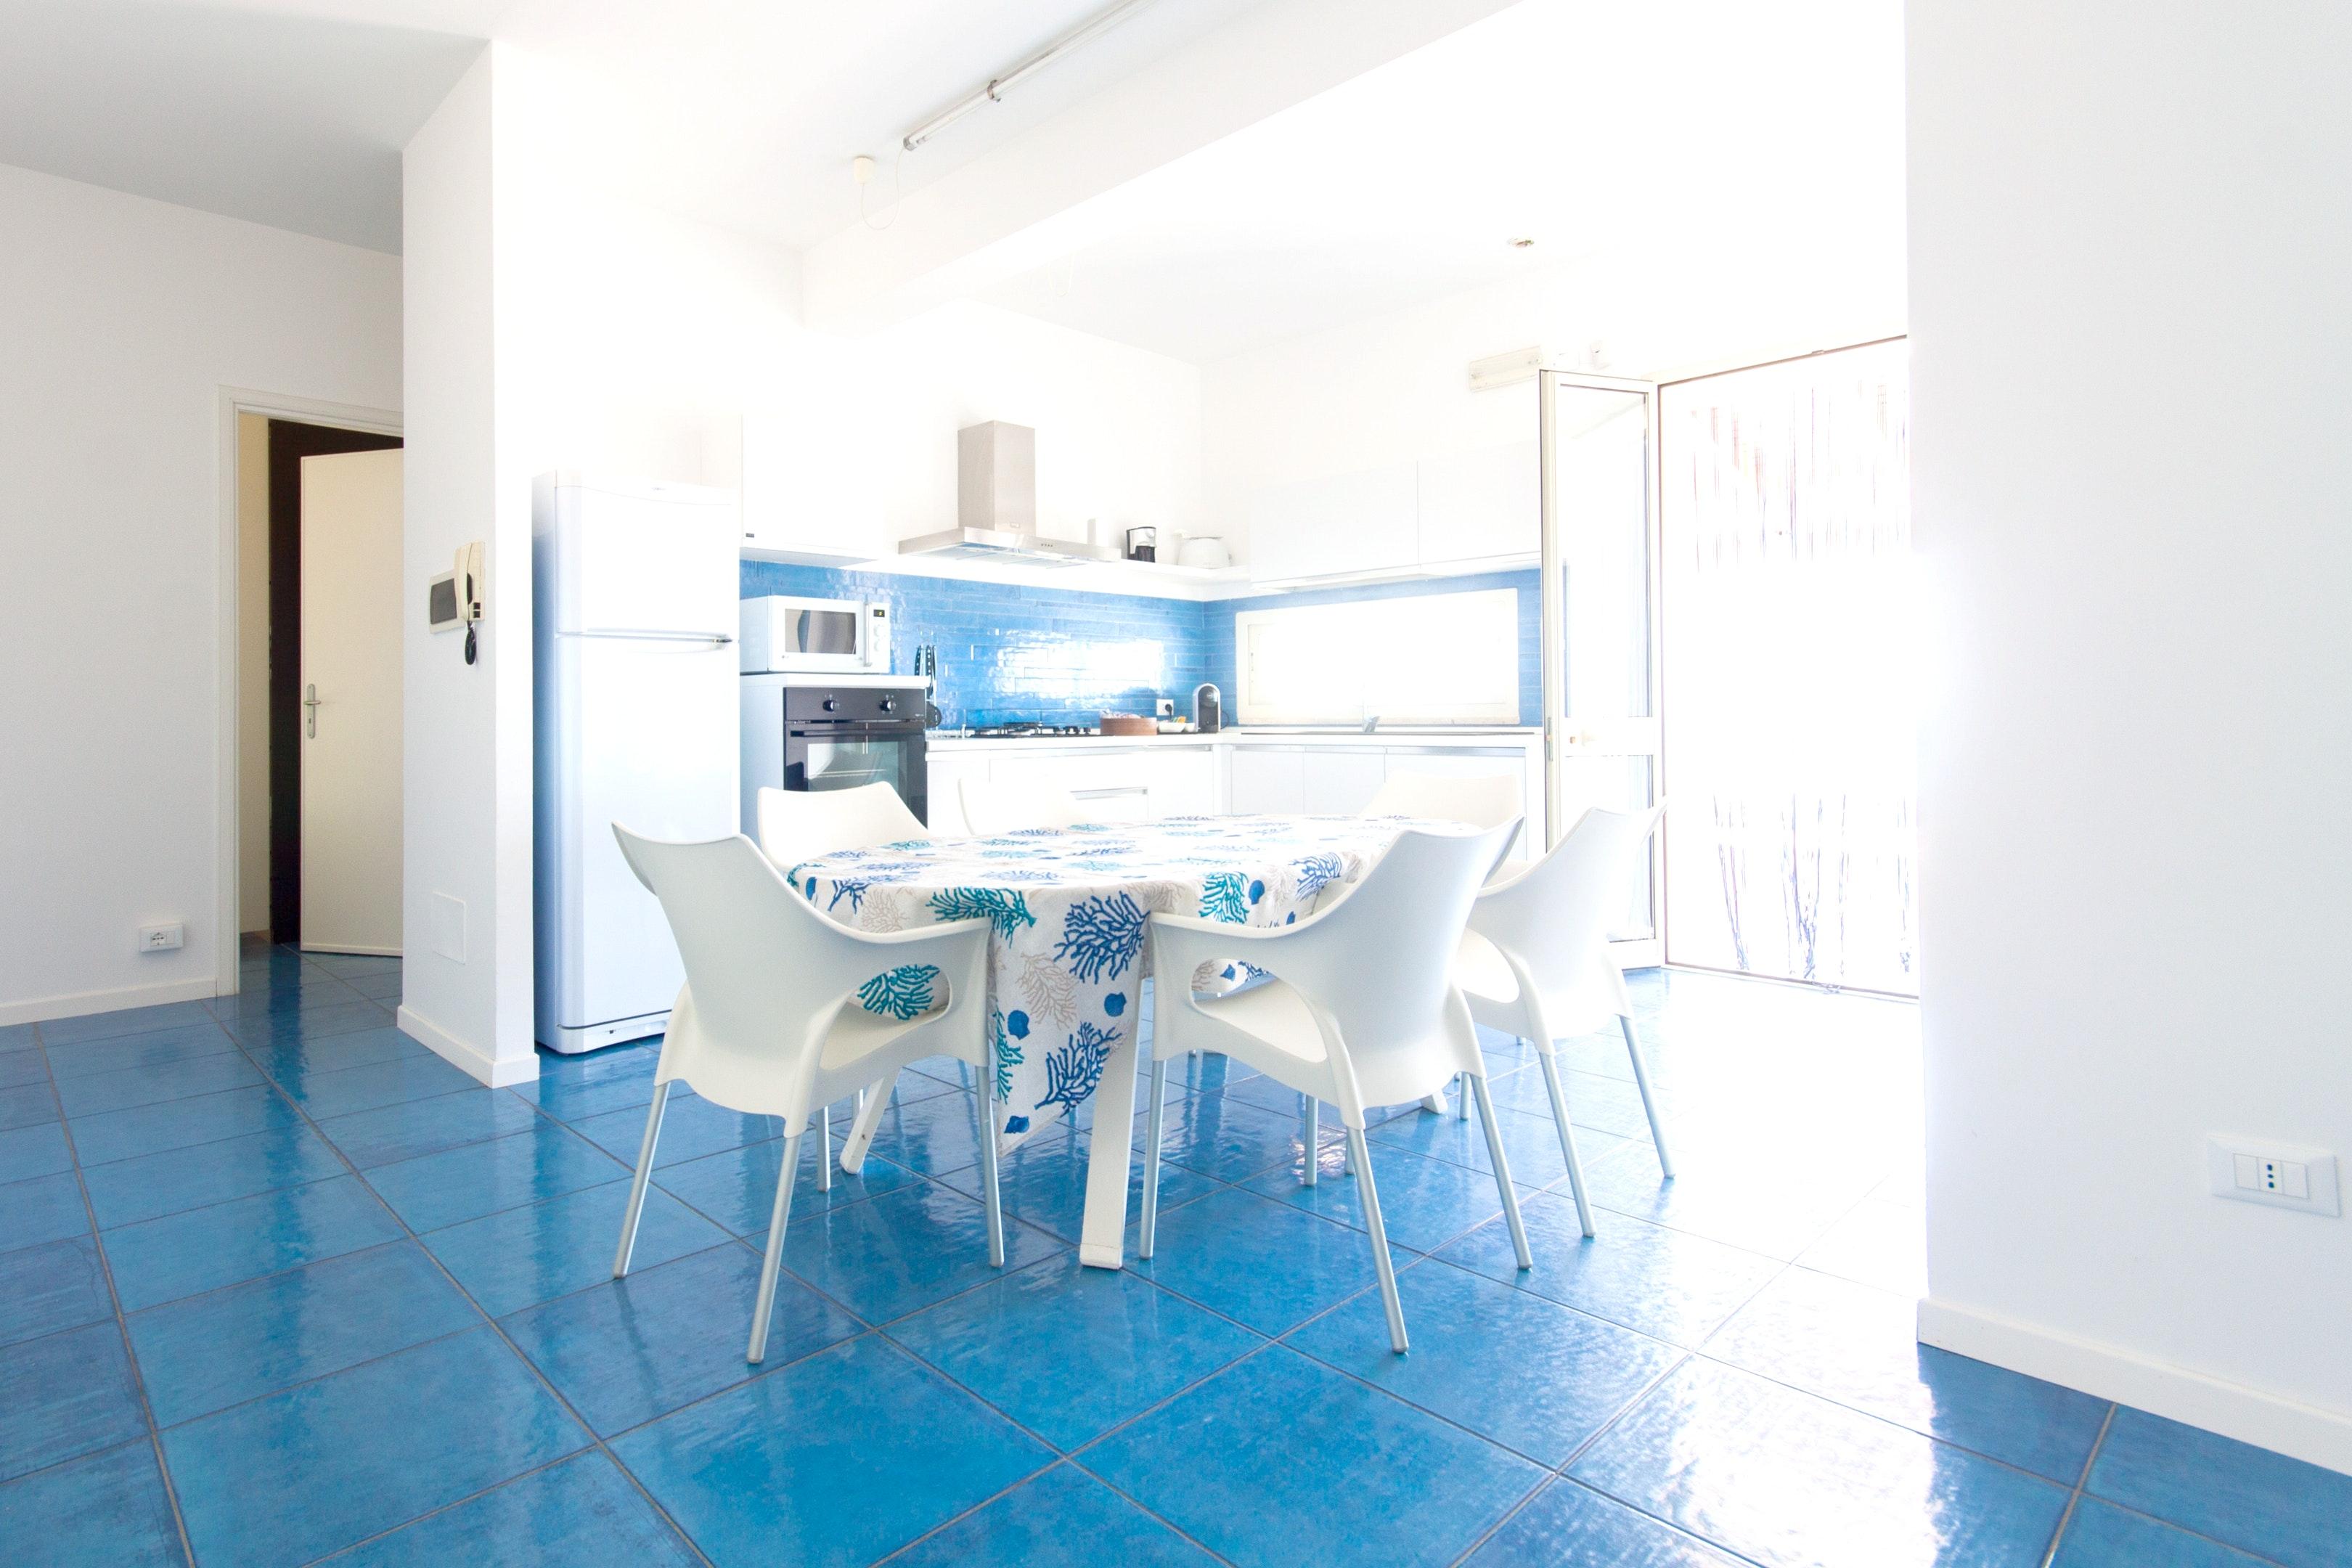 Holiday apartment Wohnung mit 4 Schlafzimmern in Piano di Trappeto mit herrlichem Meerblick, möblierter Terr (2236750), Balestrate, Palermo, Sicily, Italy, picture 9